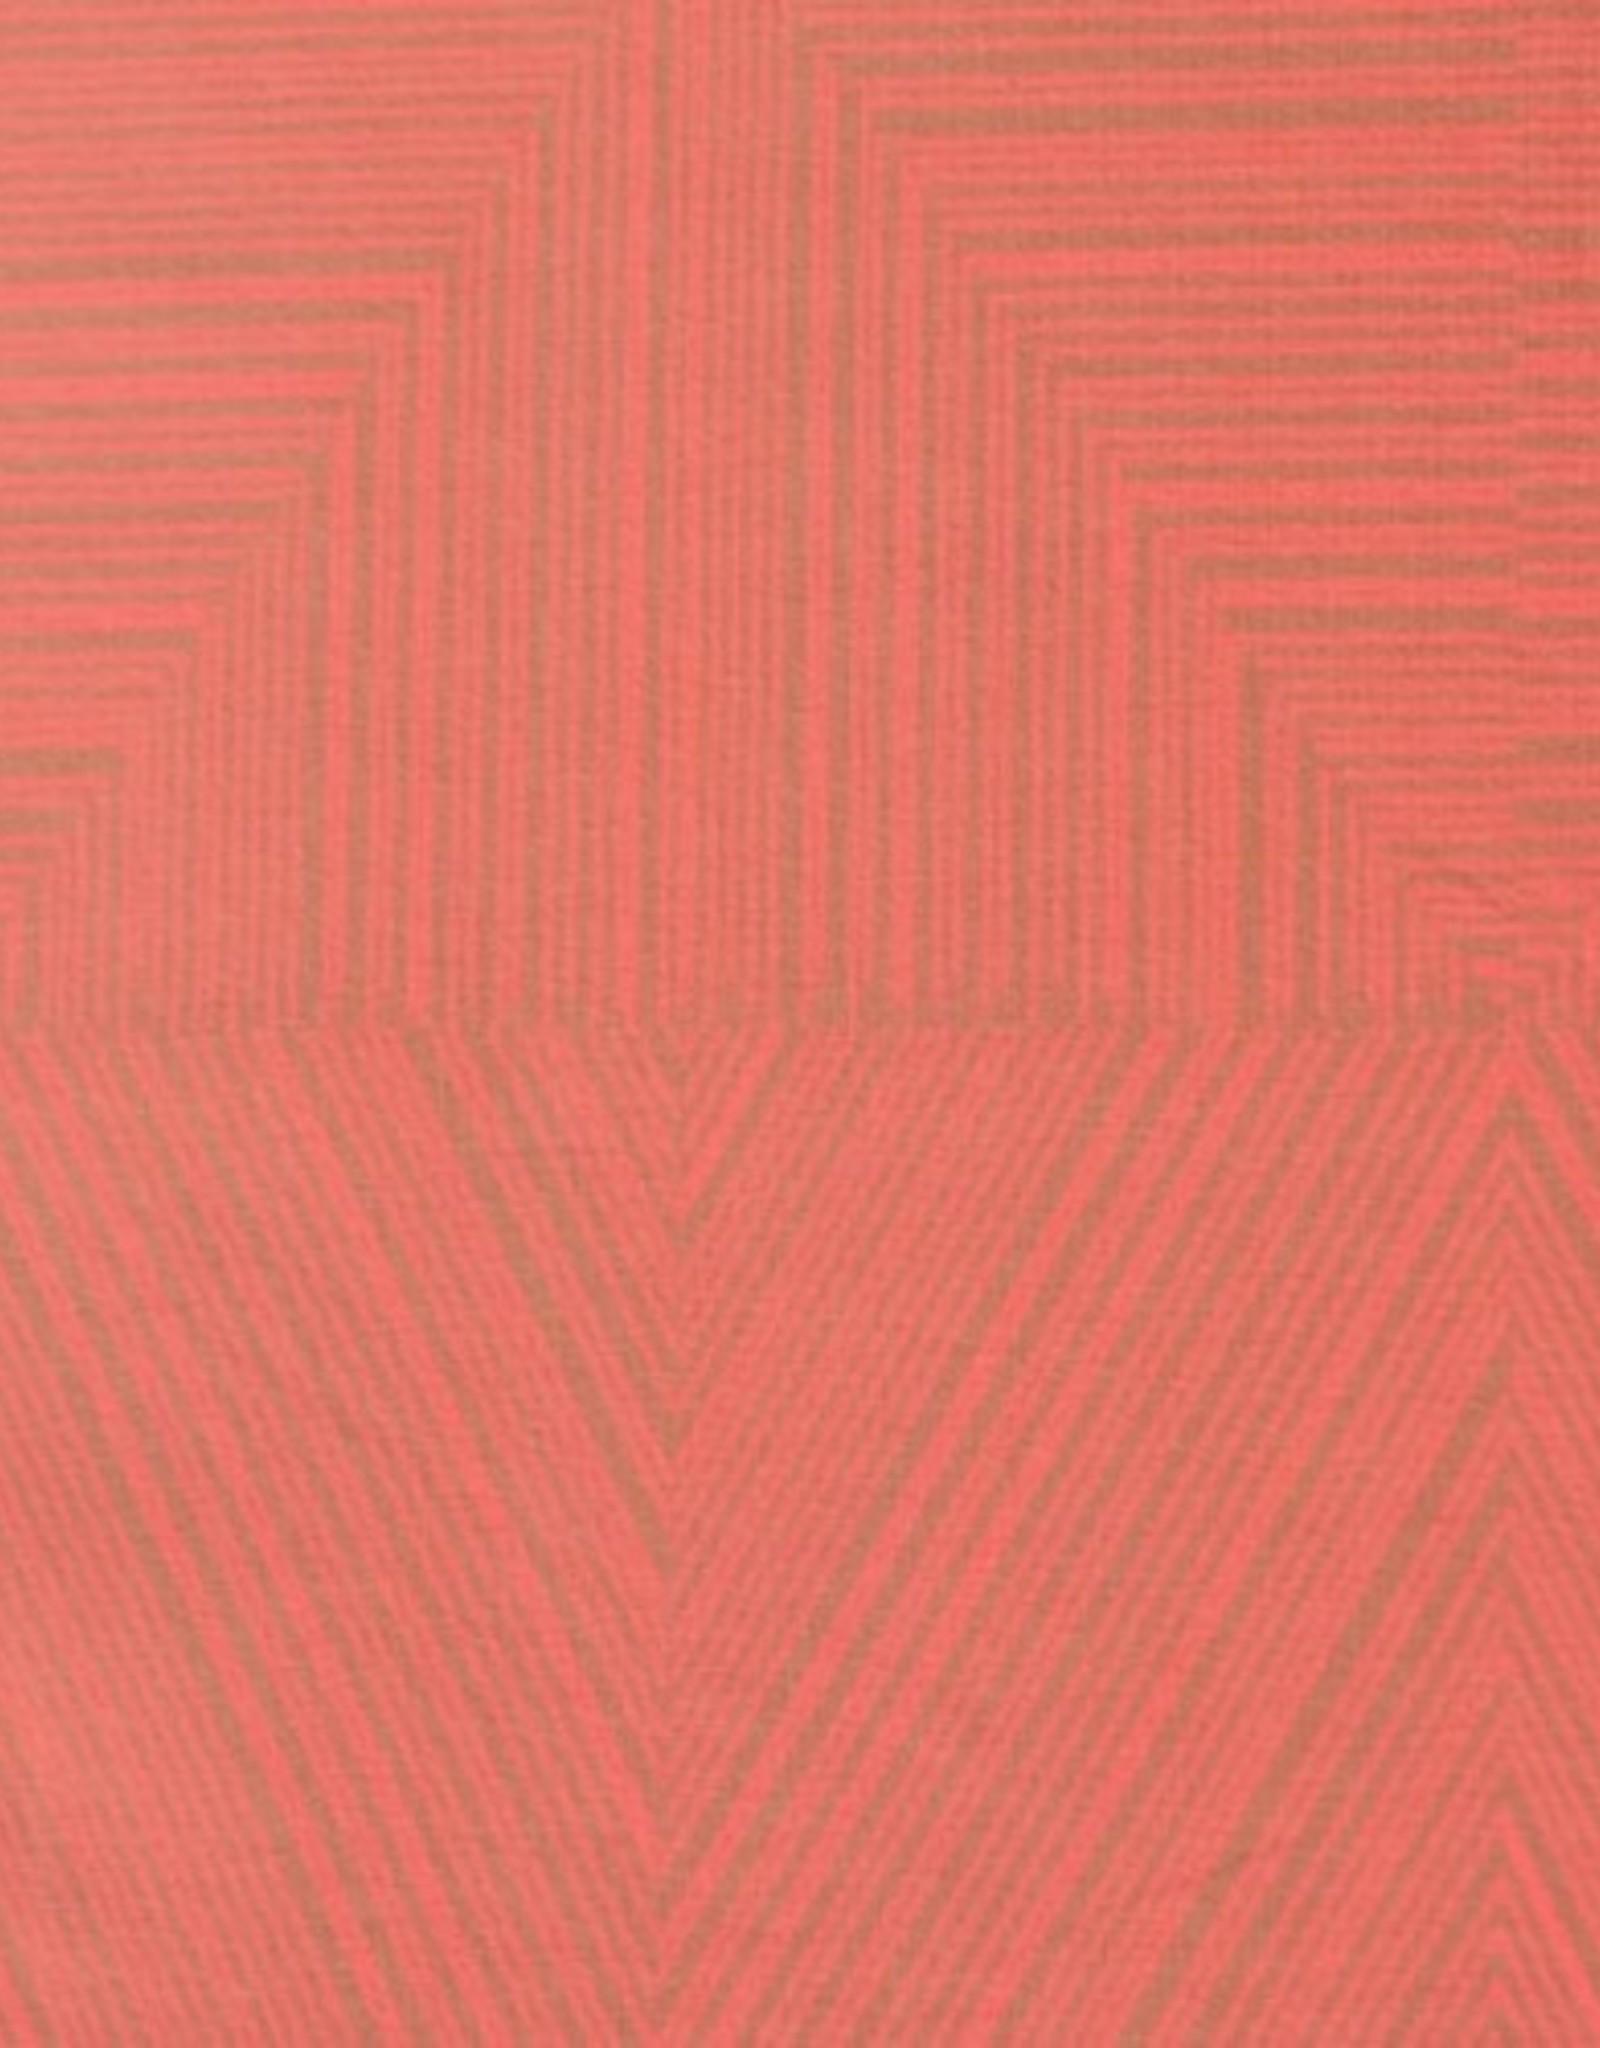 Lotte Martens Corax rood/oranje